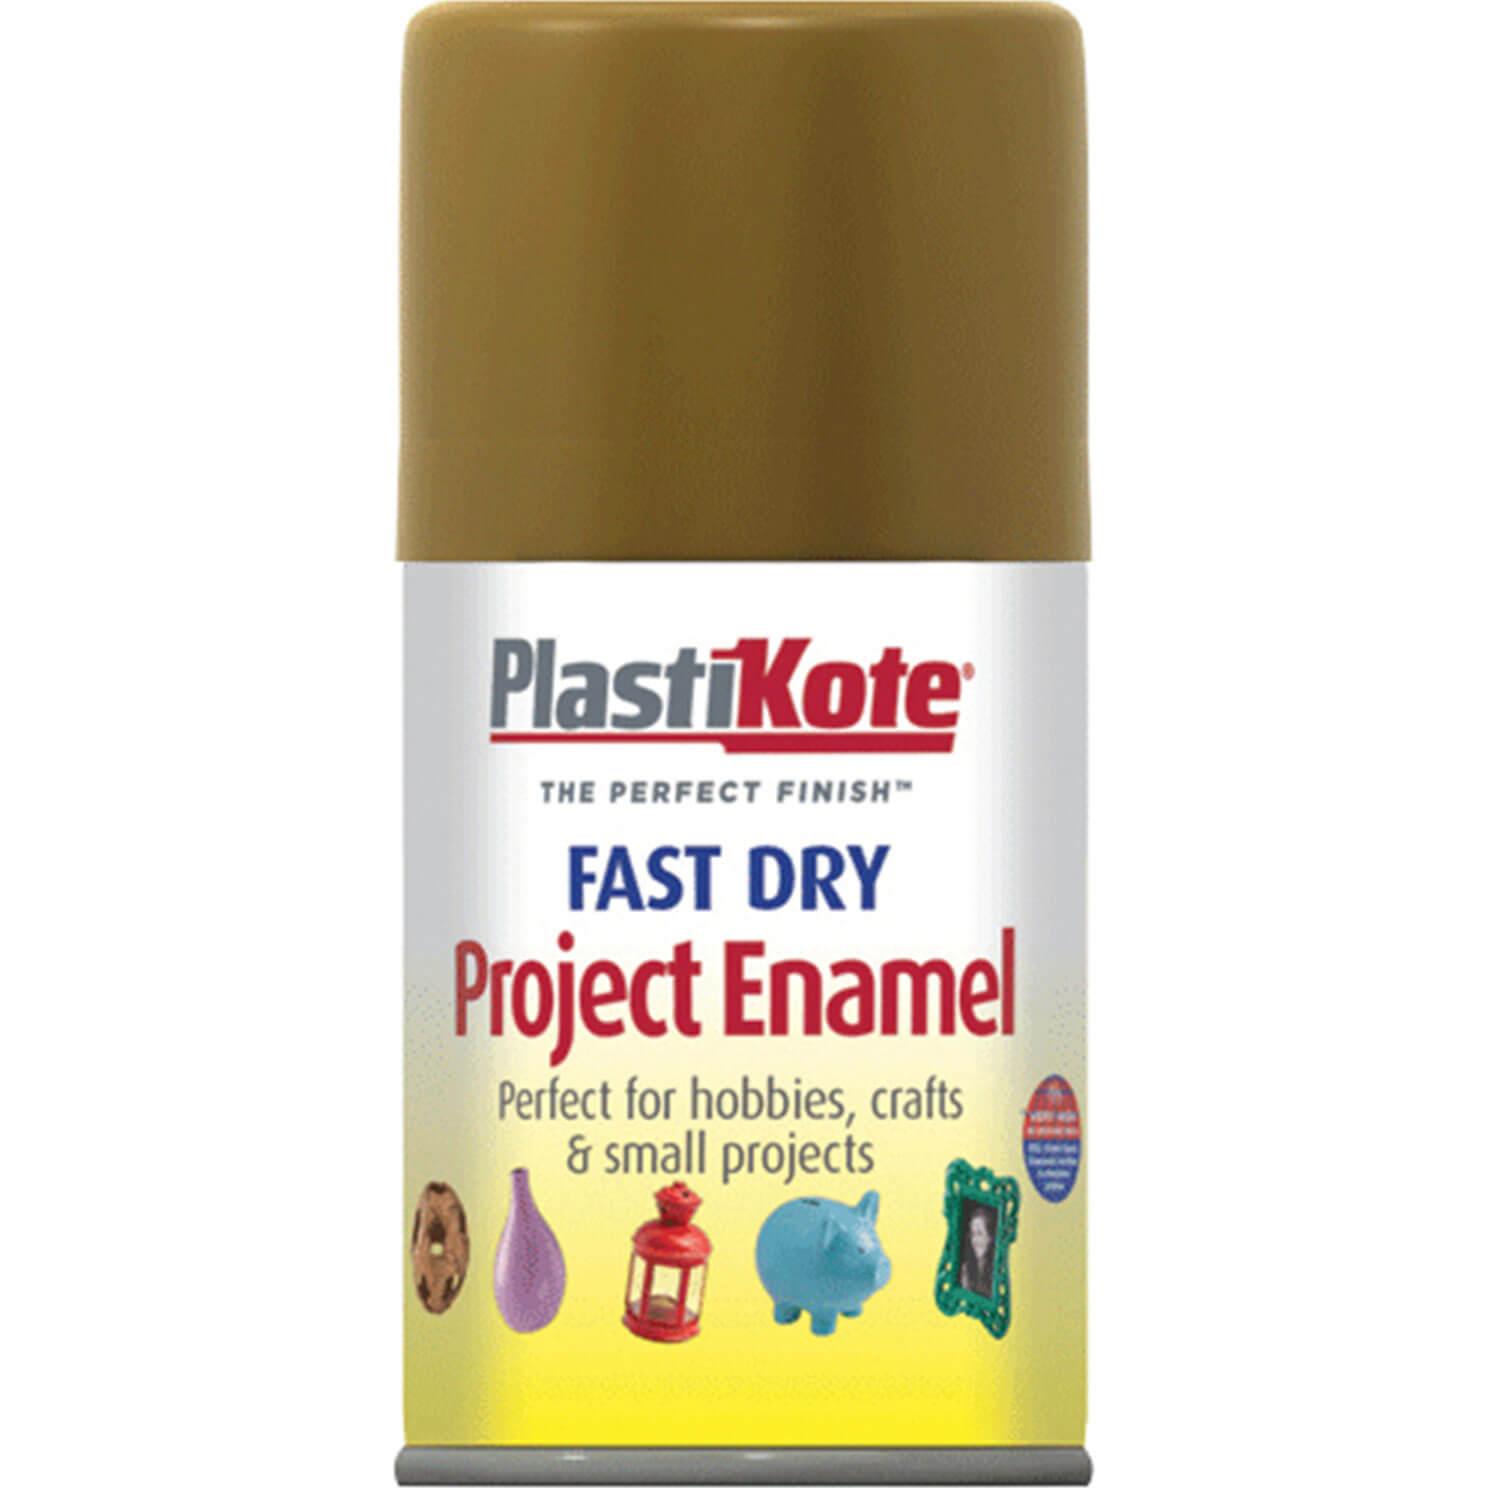 Image of Plastikote Dry Enamel Aerosol Spray Paint Anitque Gold 100ml